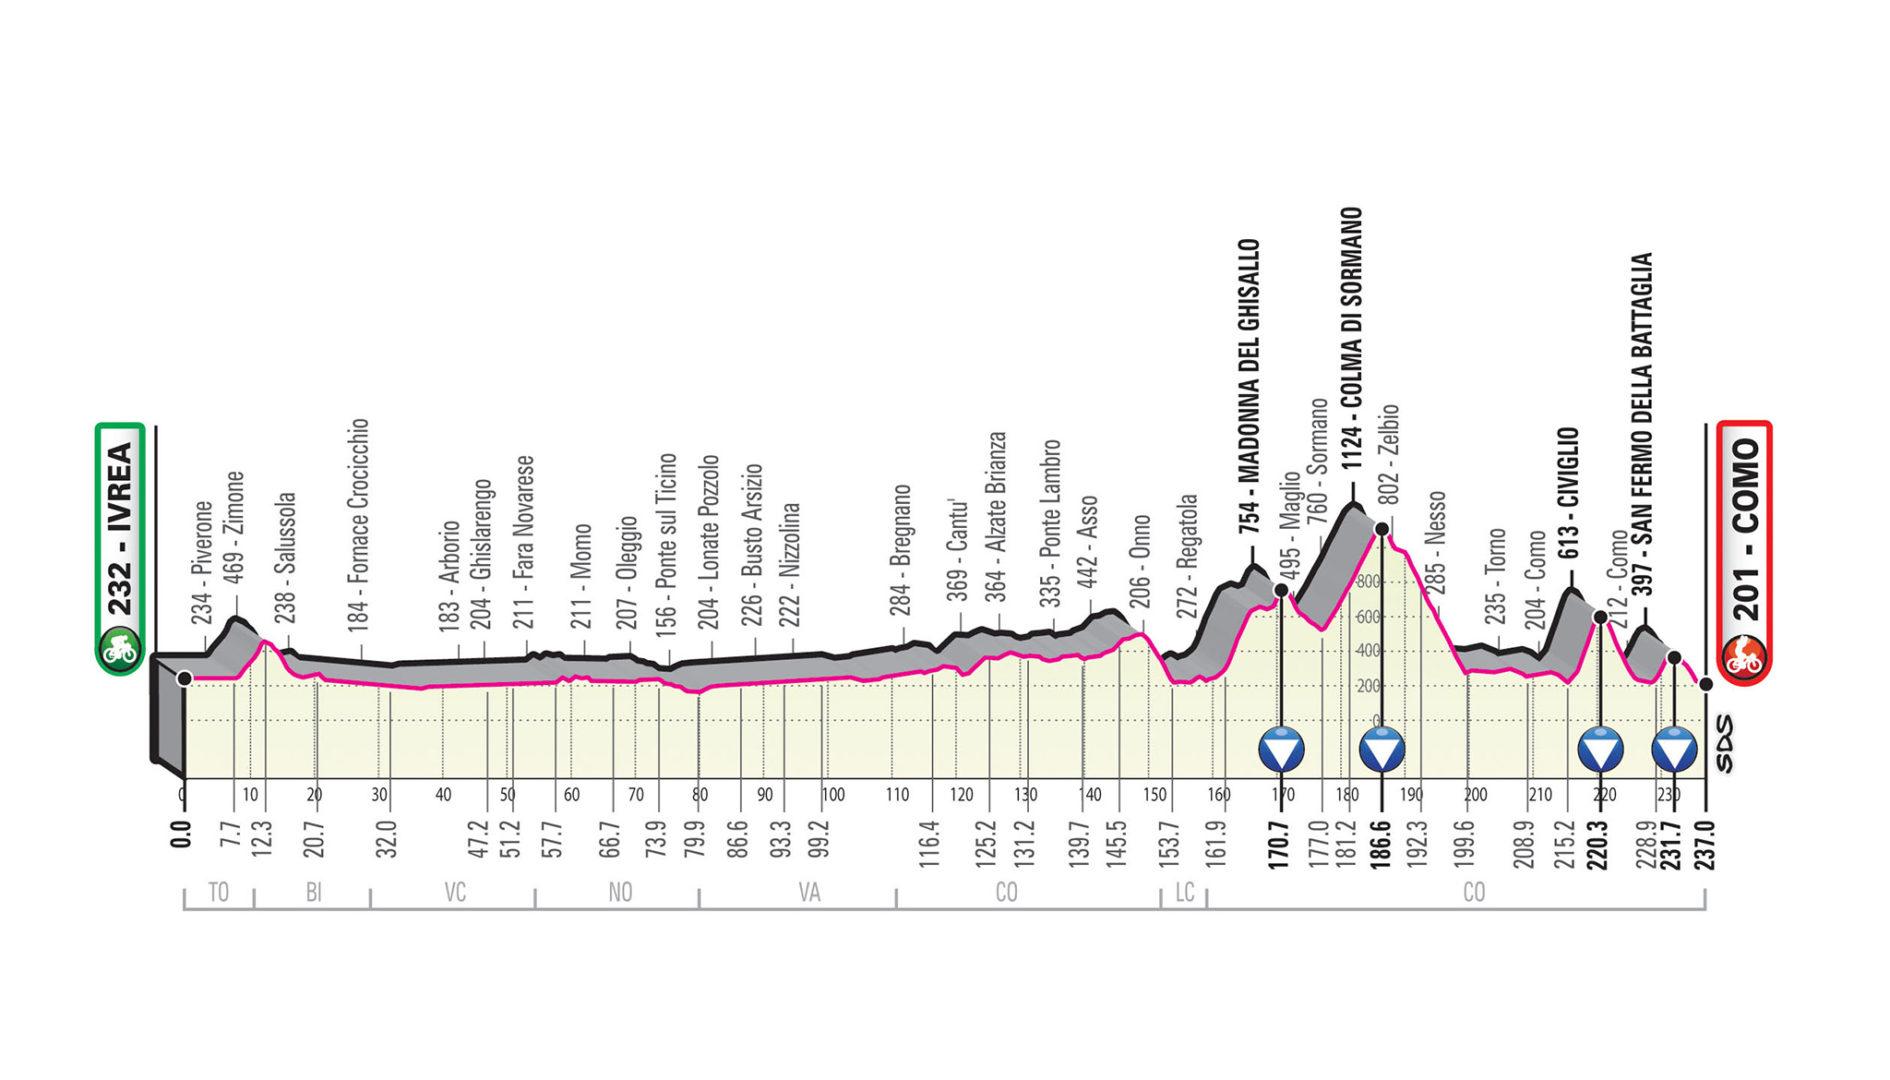 Ivrea – Como. 237 kms.